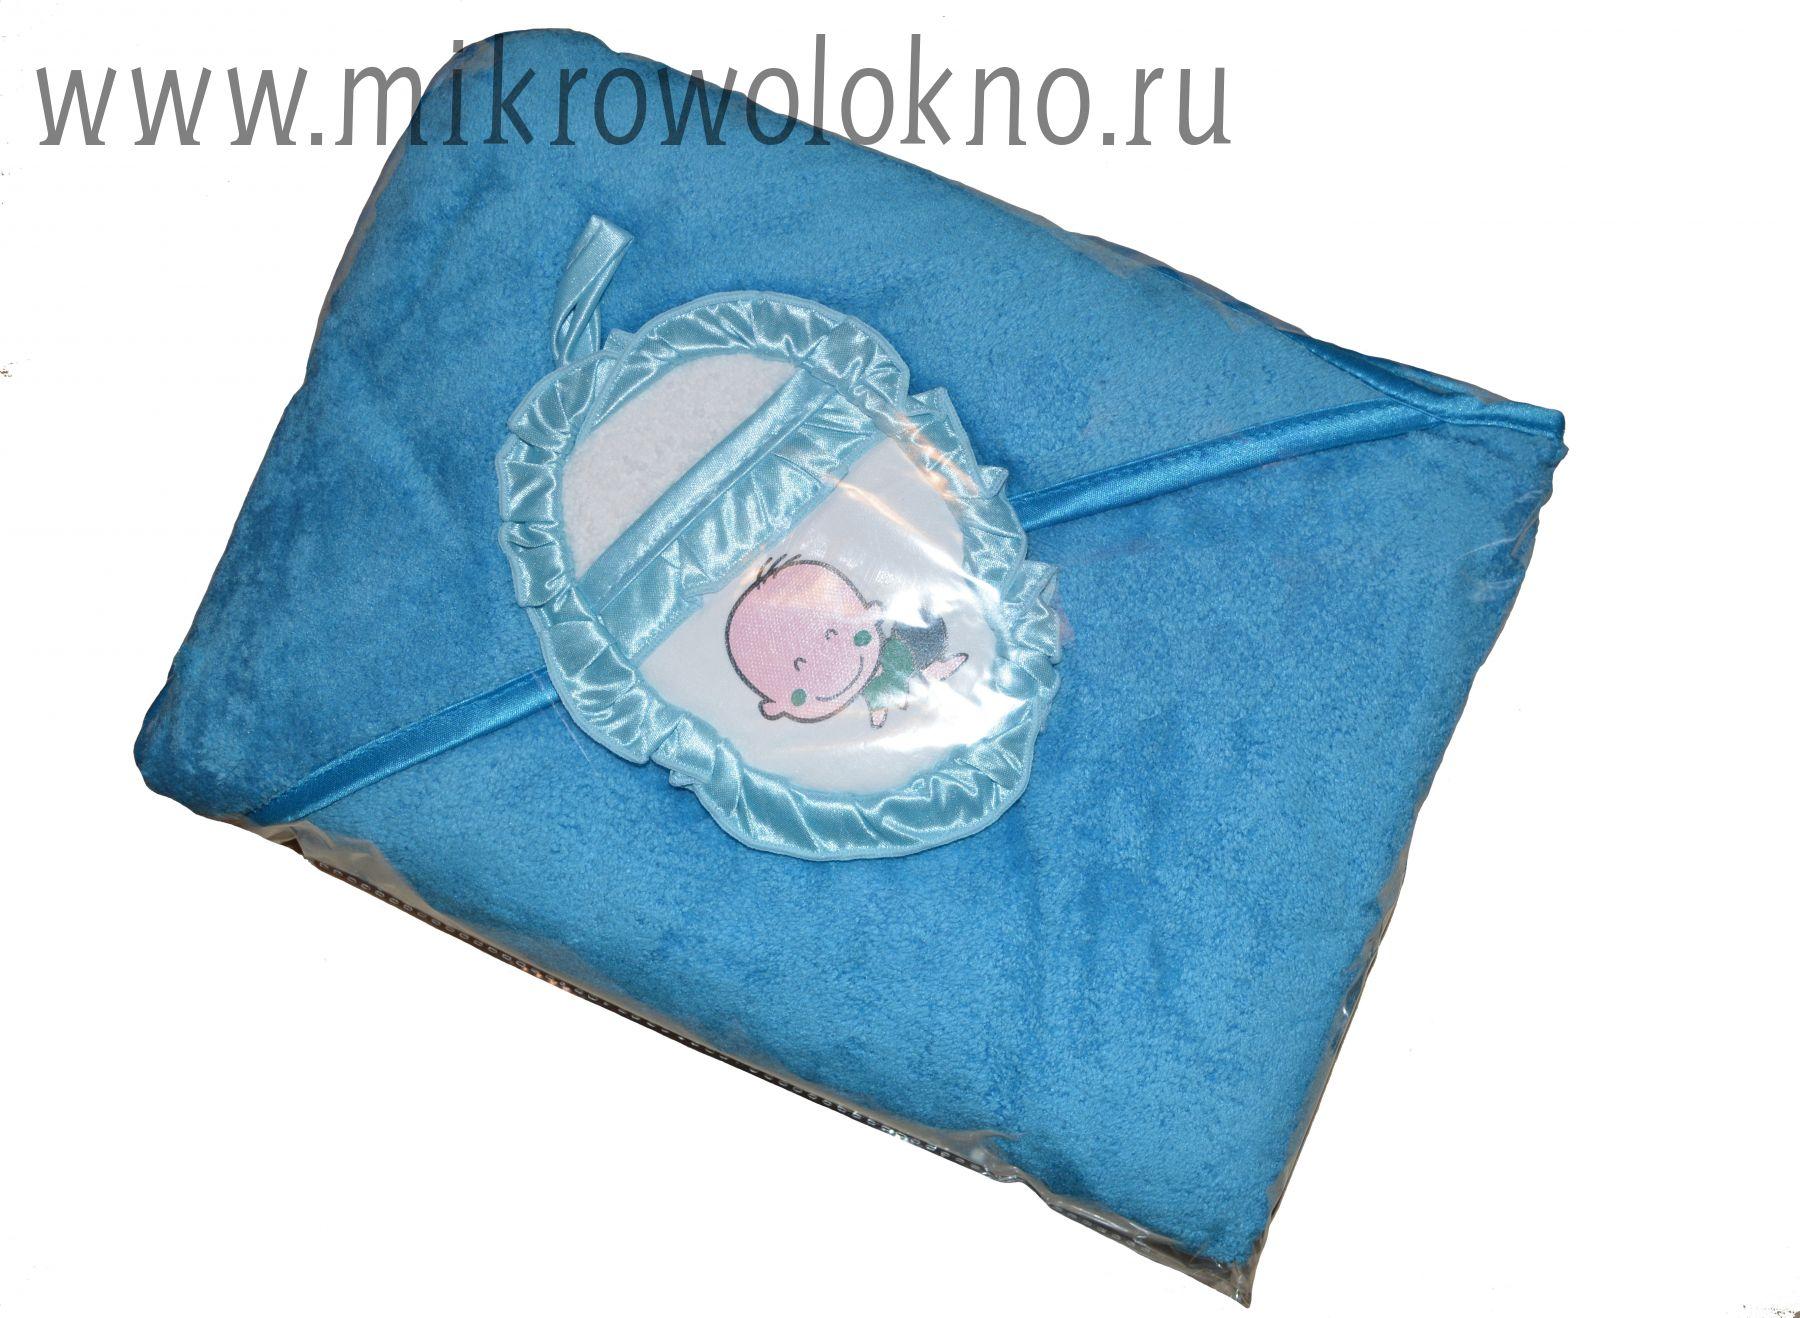 Детский набор: полотенце и варежка-мочалка